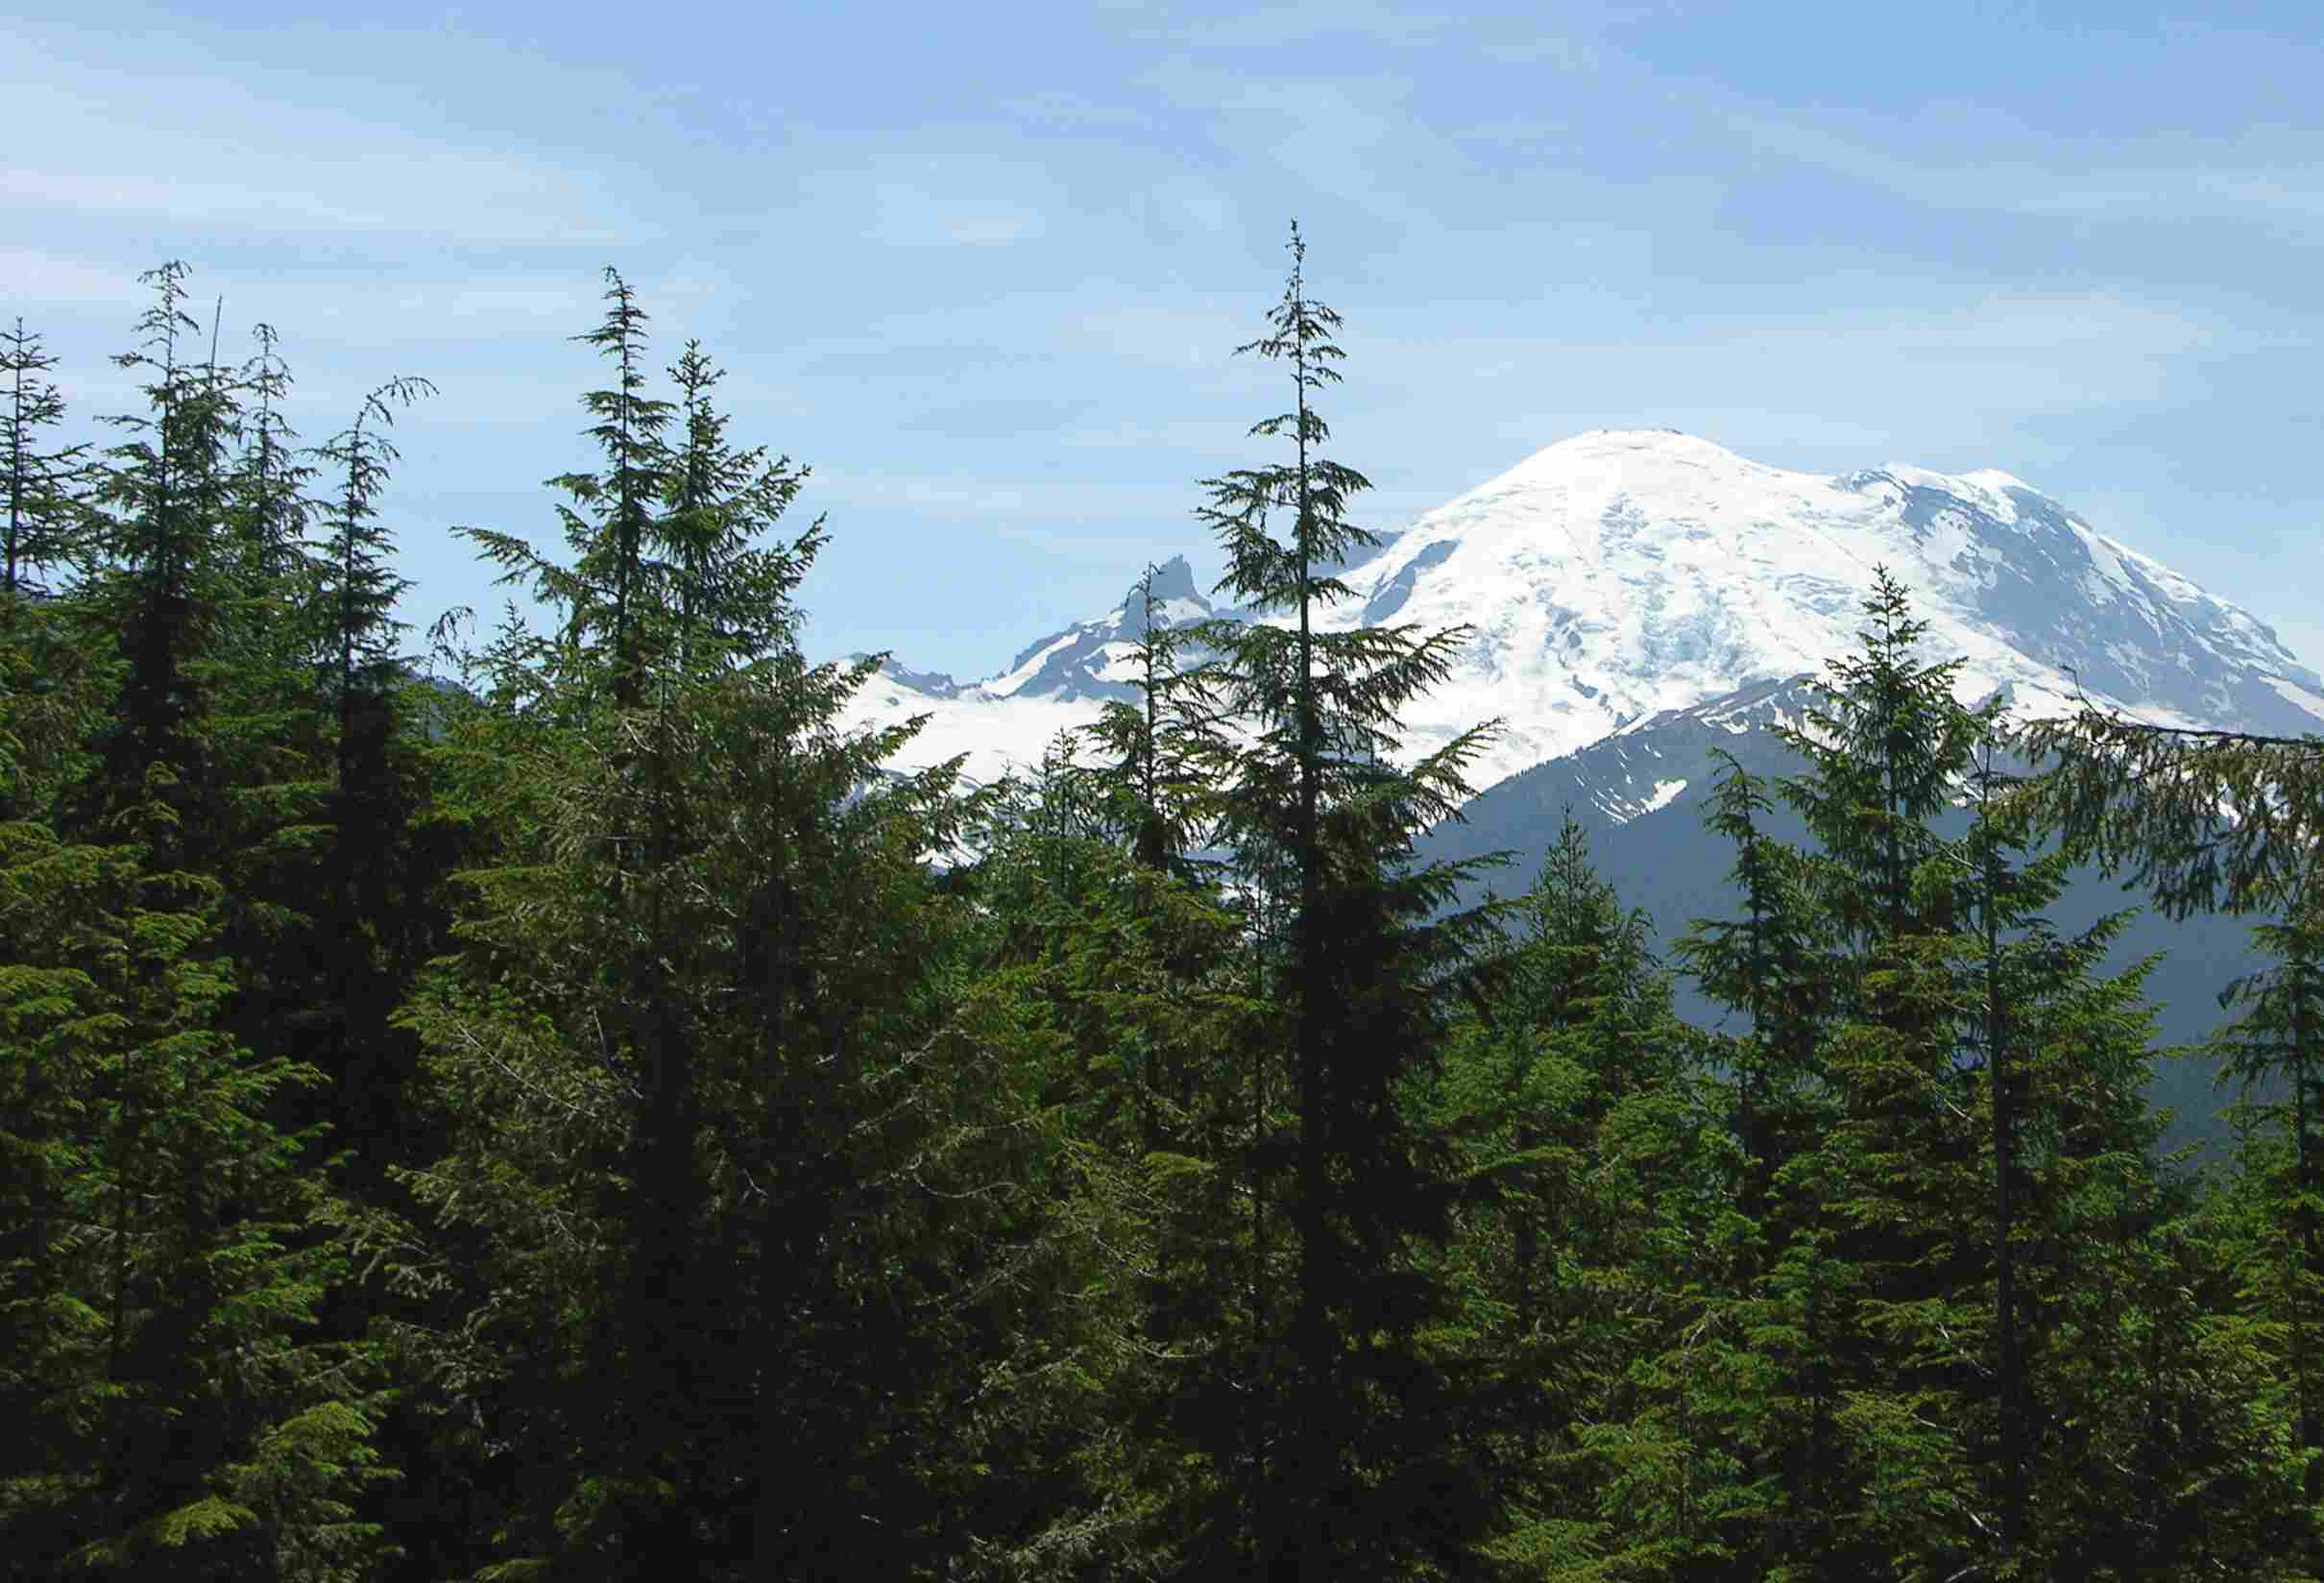 Western hemlock trees in front of mountain range.